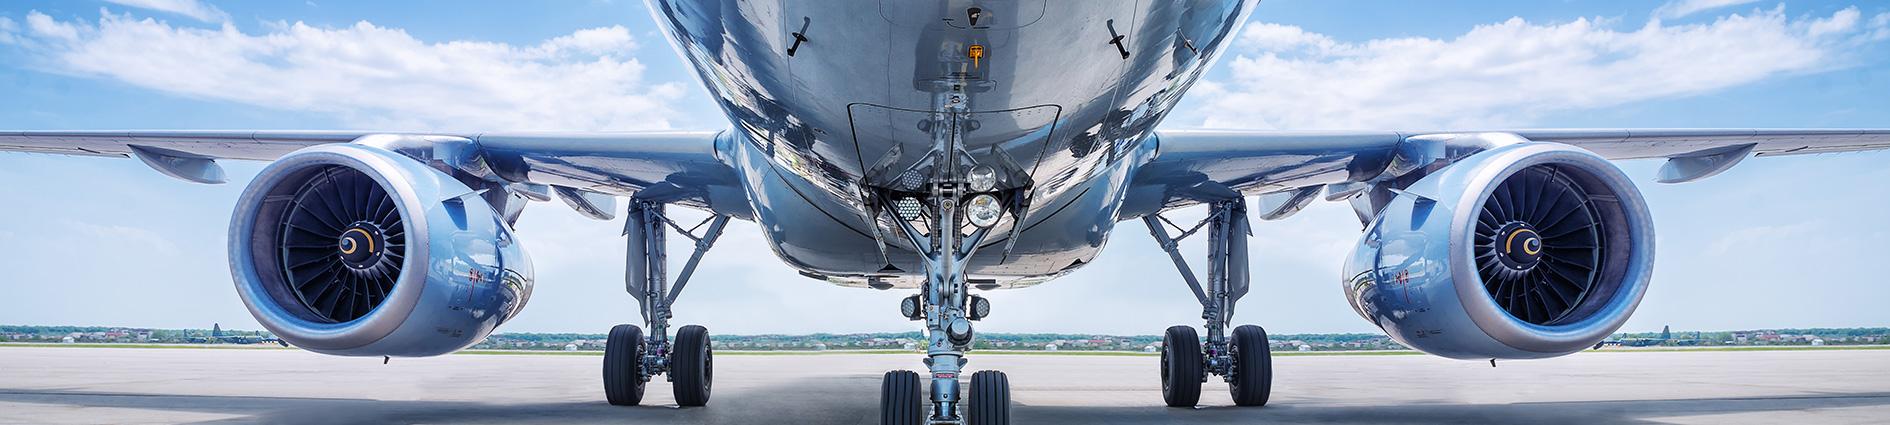 Solors_Header_Aerospace.jpg